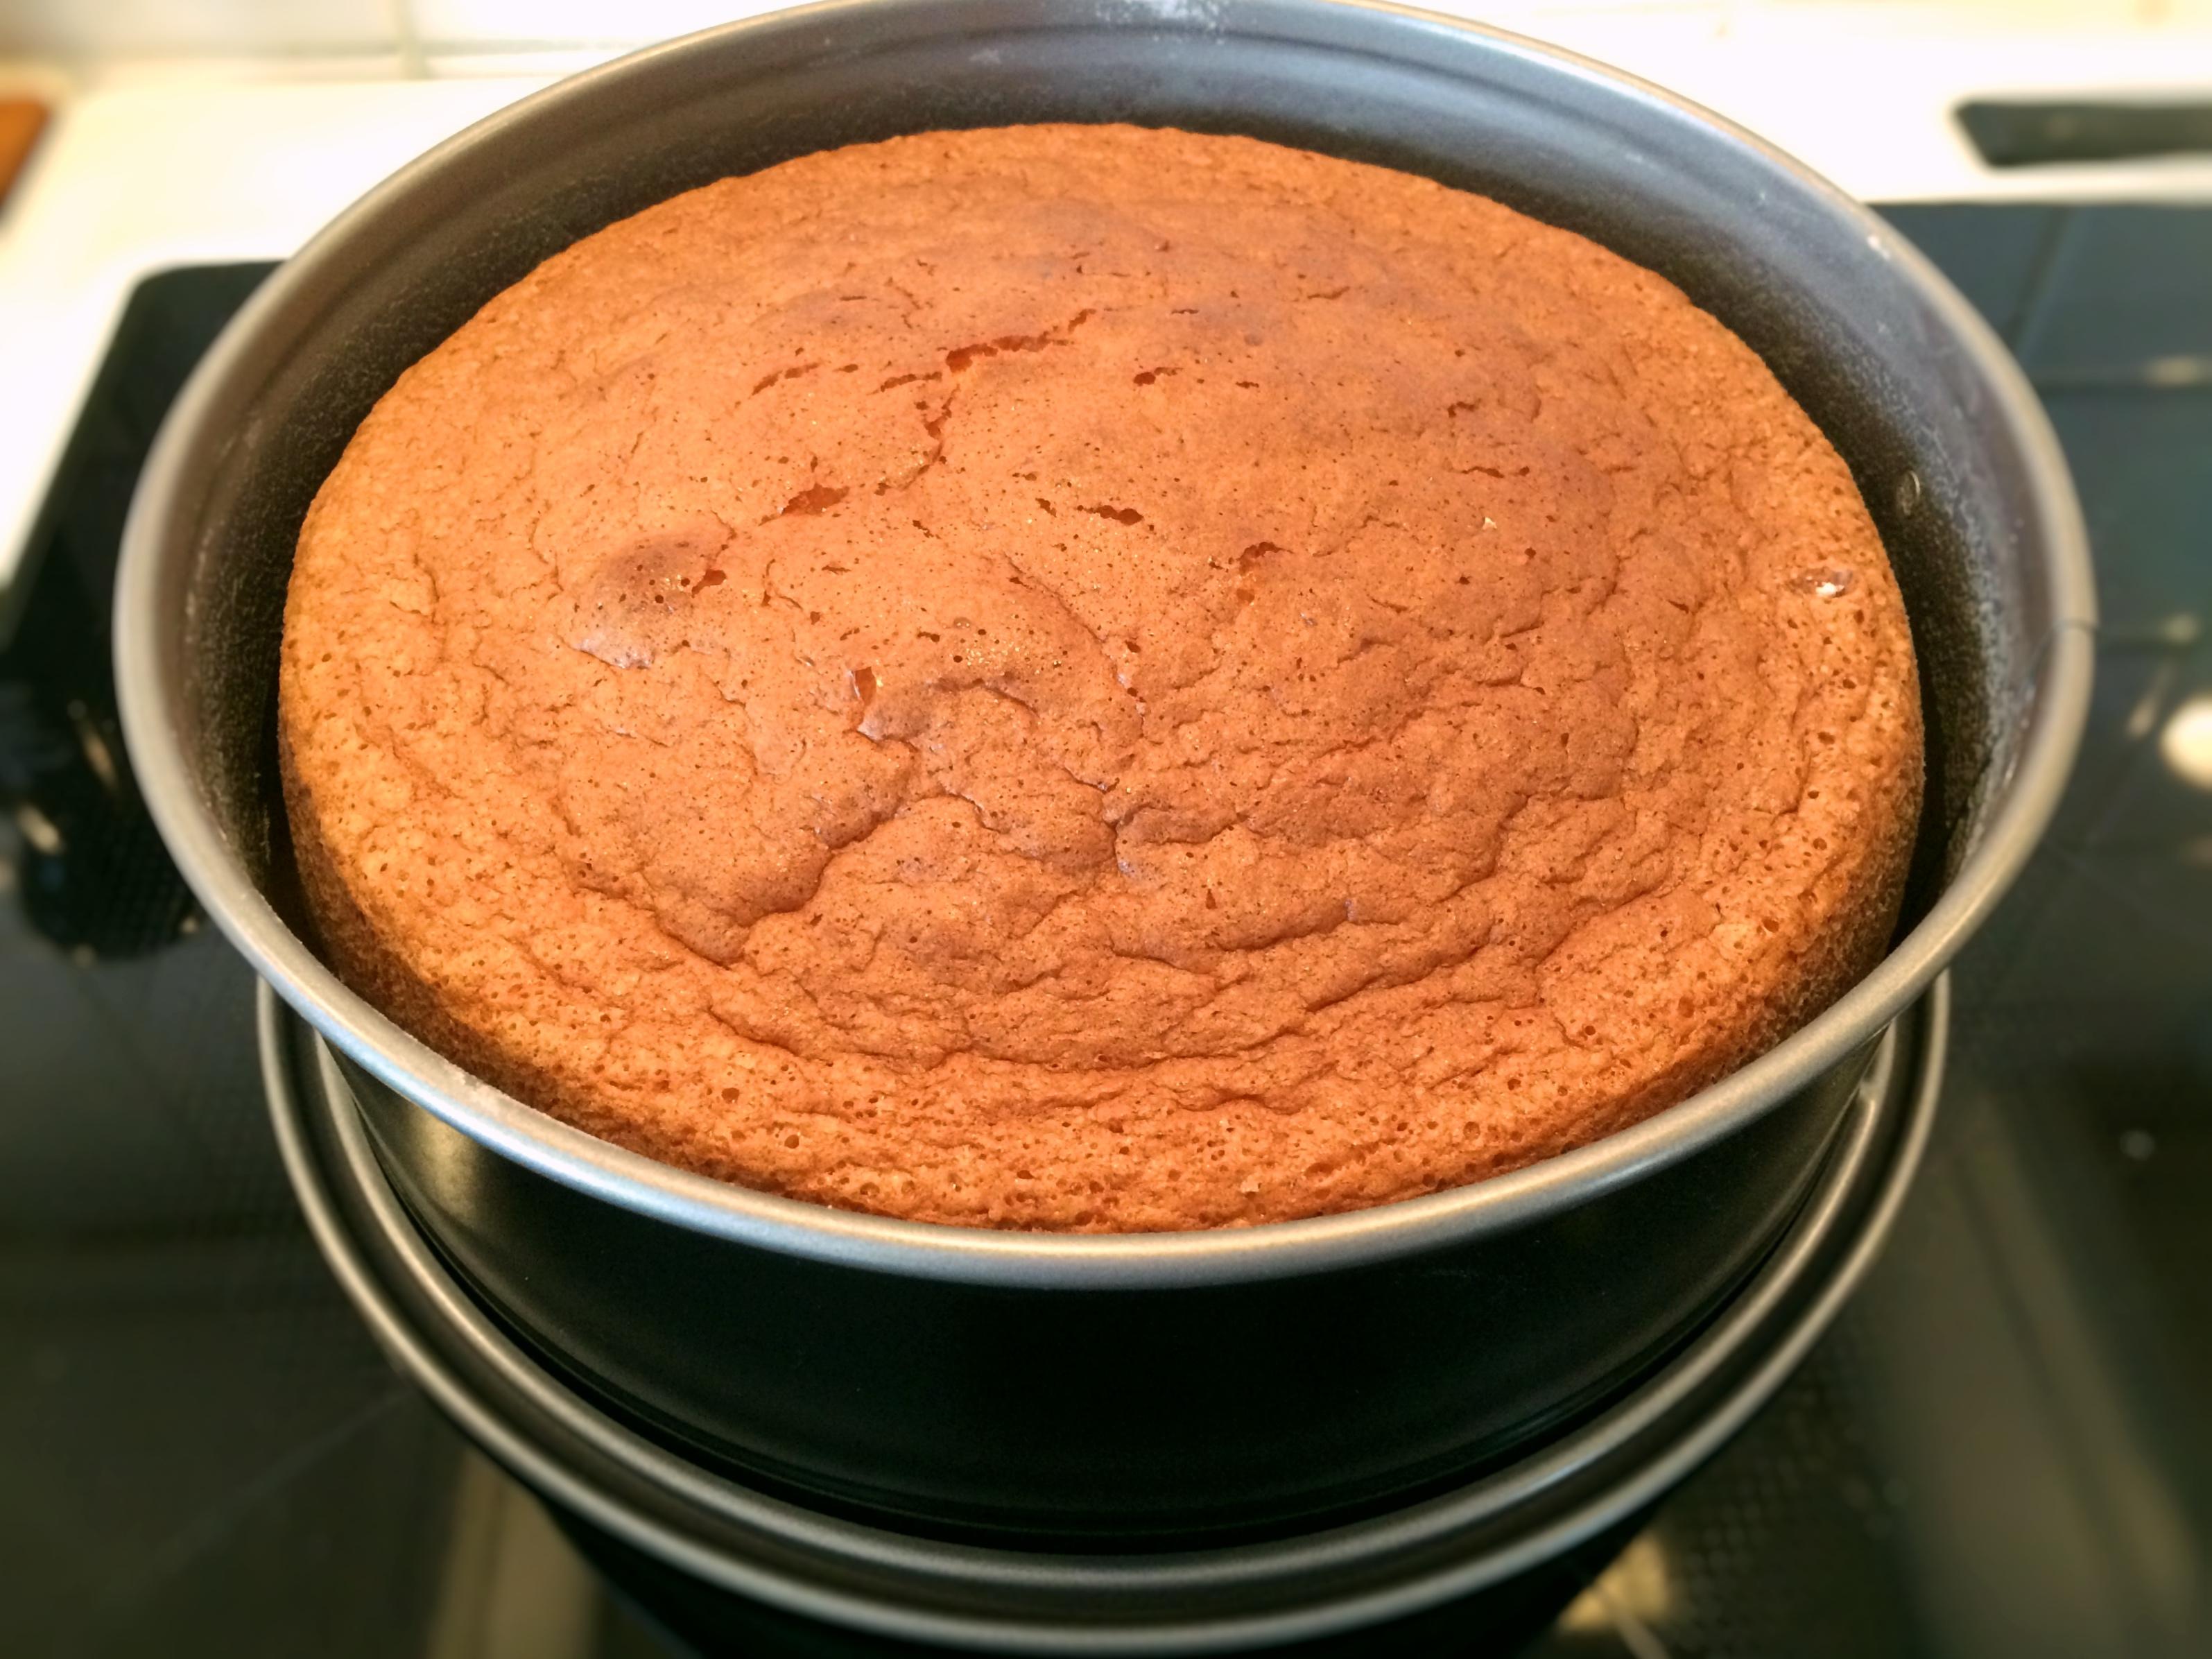 laktosfri tårtbotten köpa